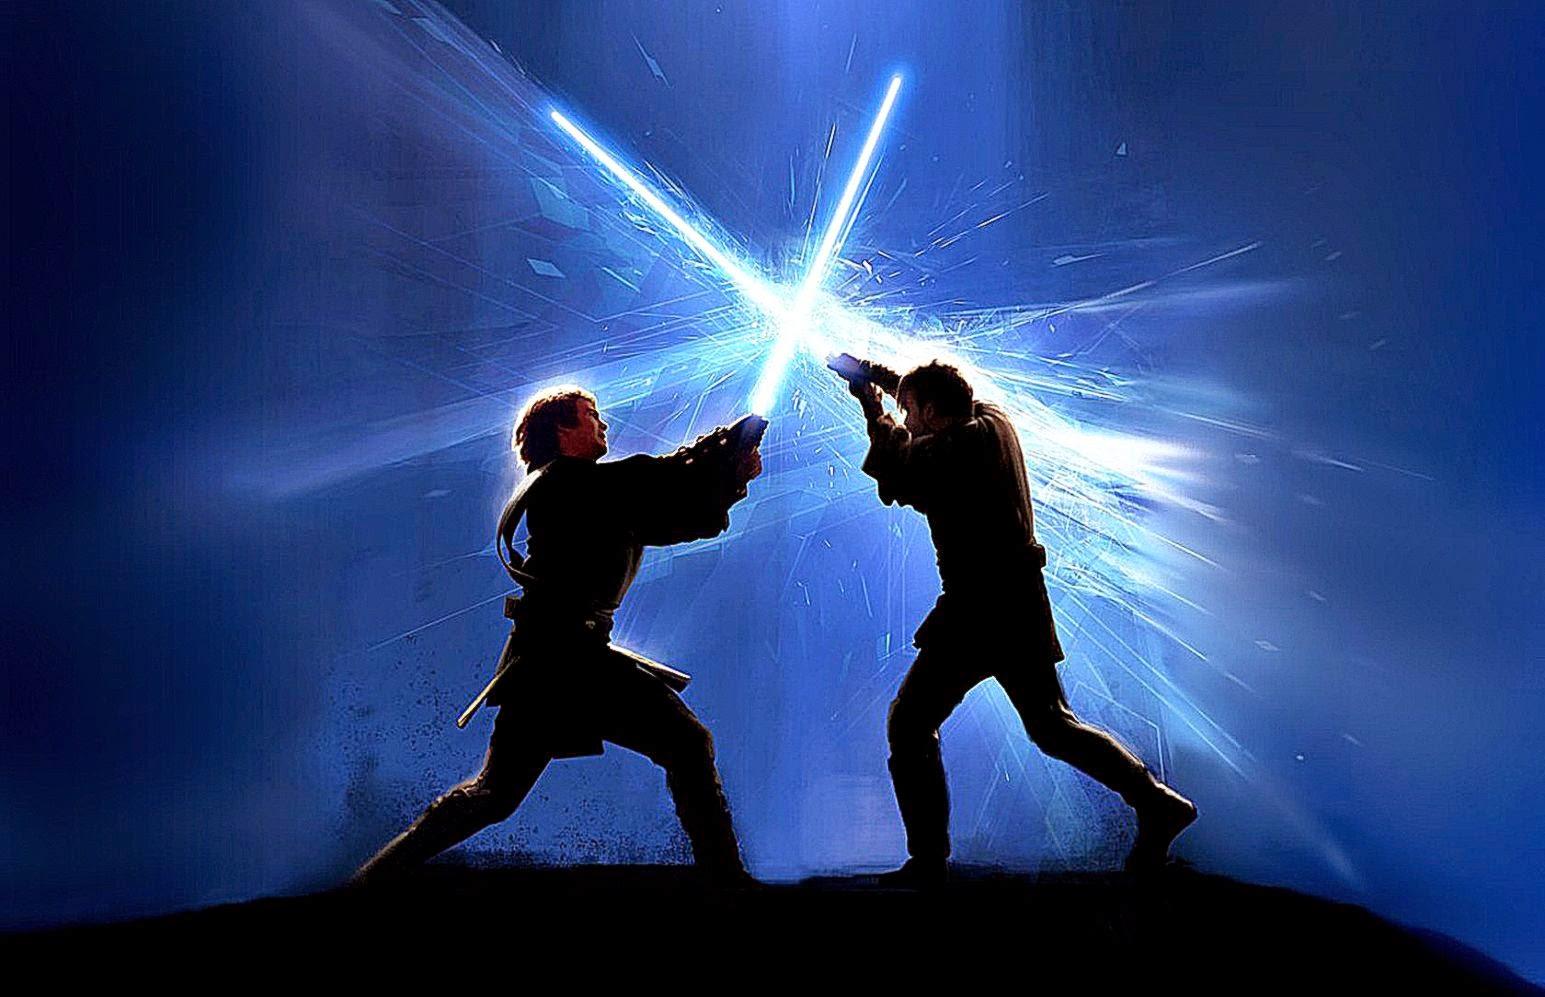 Star Wars Lightsaber Duels Wallpaper Best Free HD